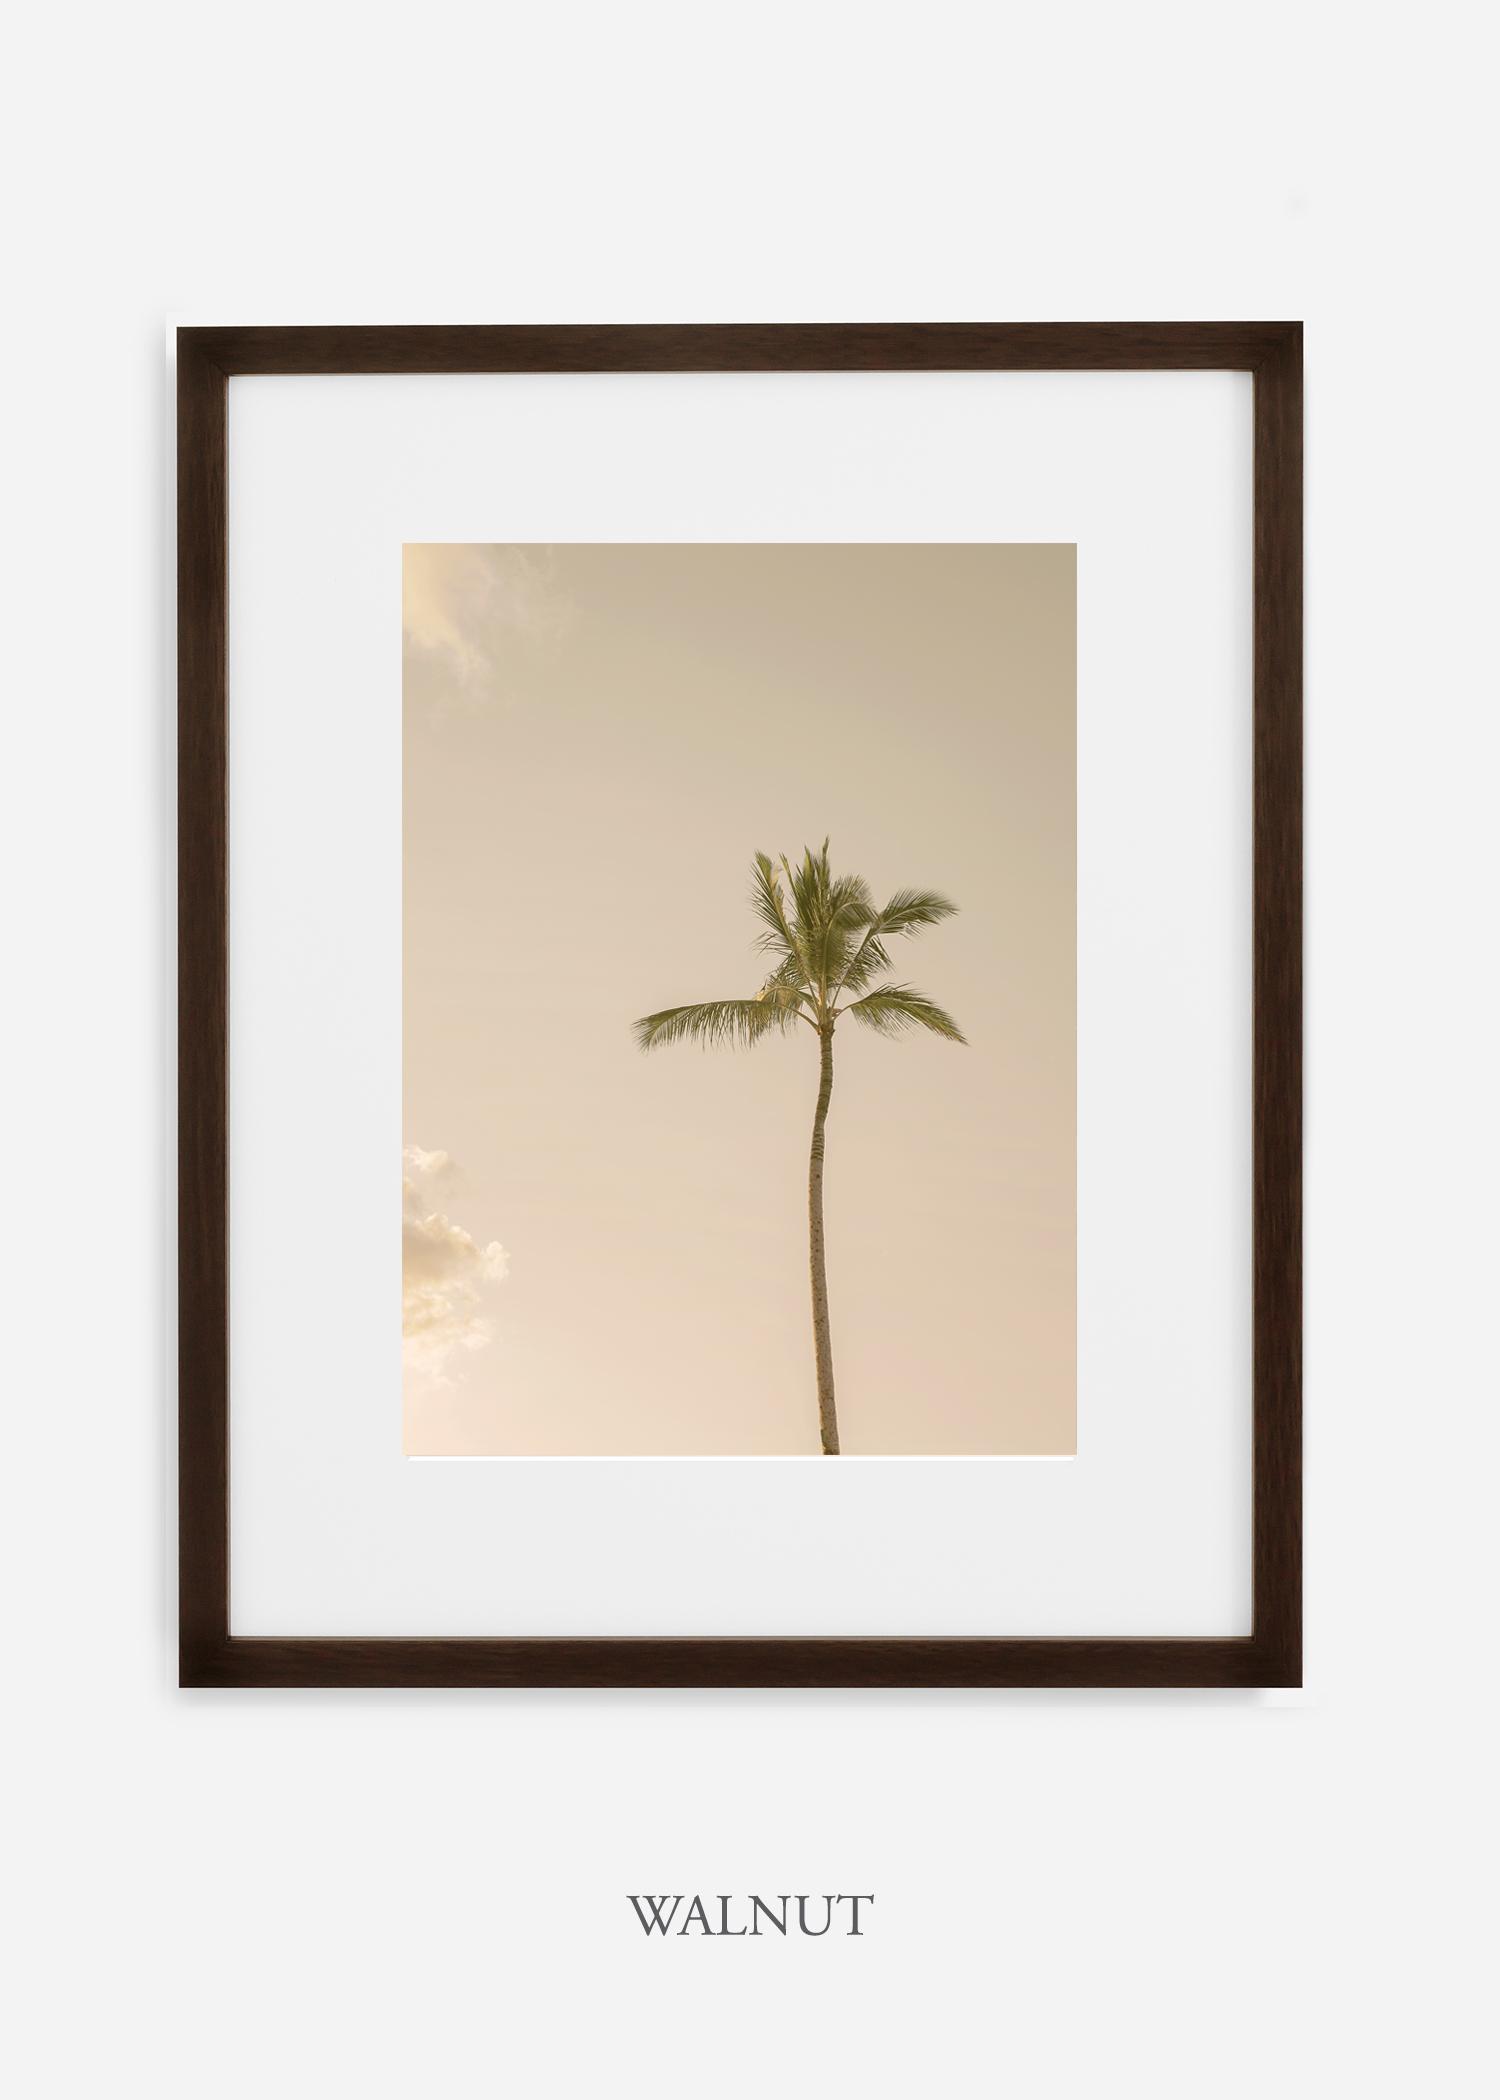 WilderCalifornia_Hawaii_lonepalm_tropicalart_walnutframe.jpg